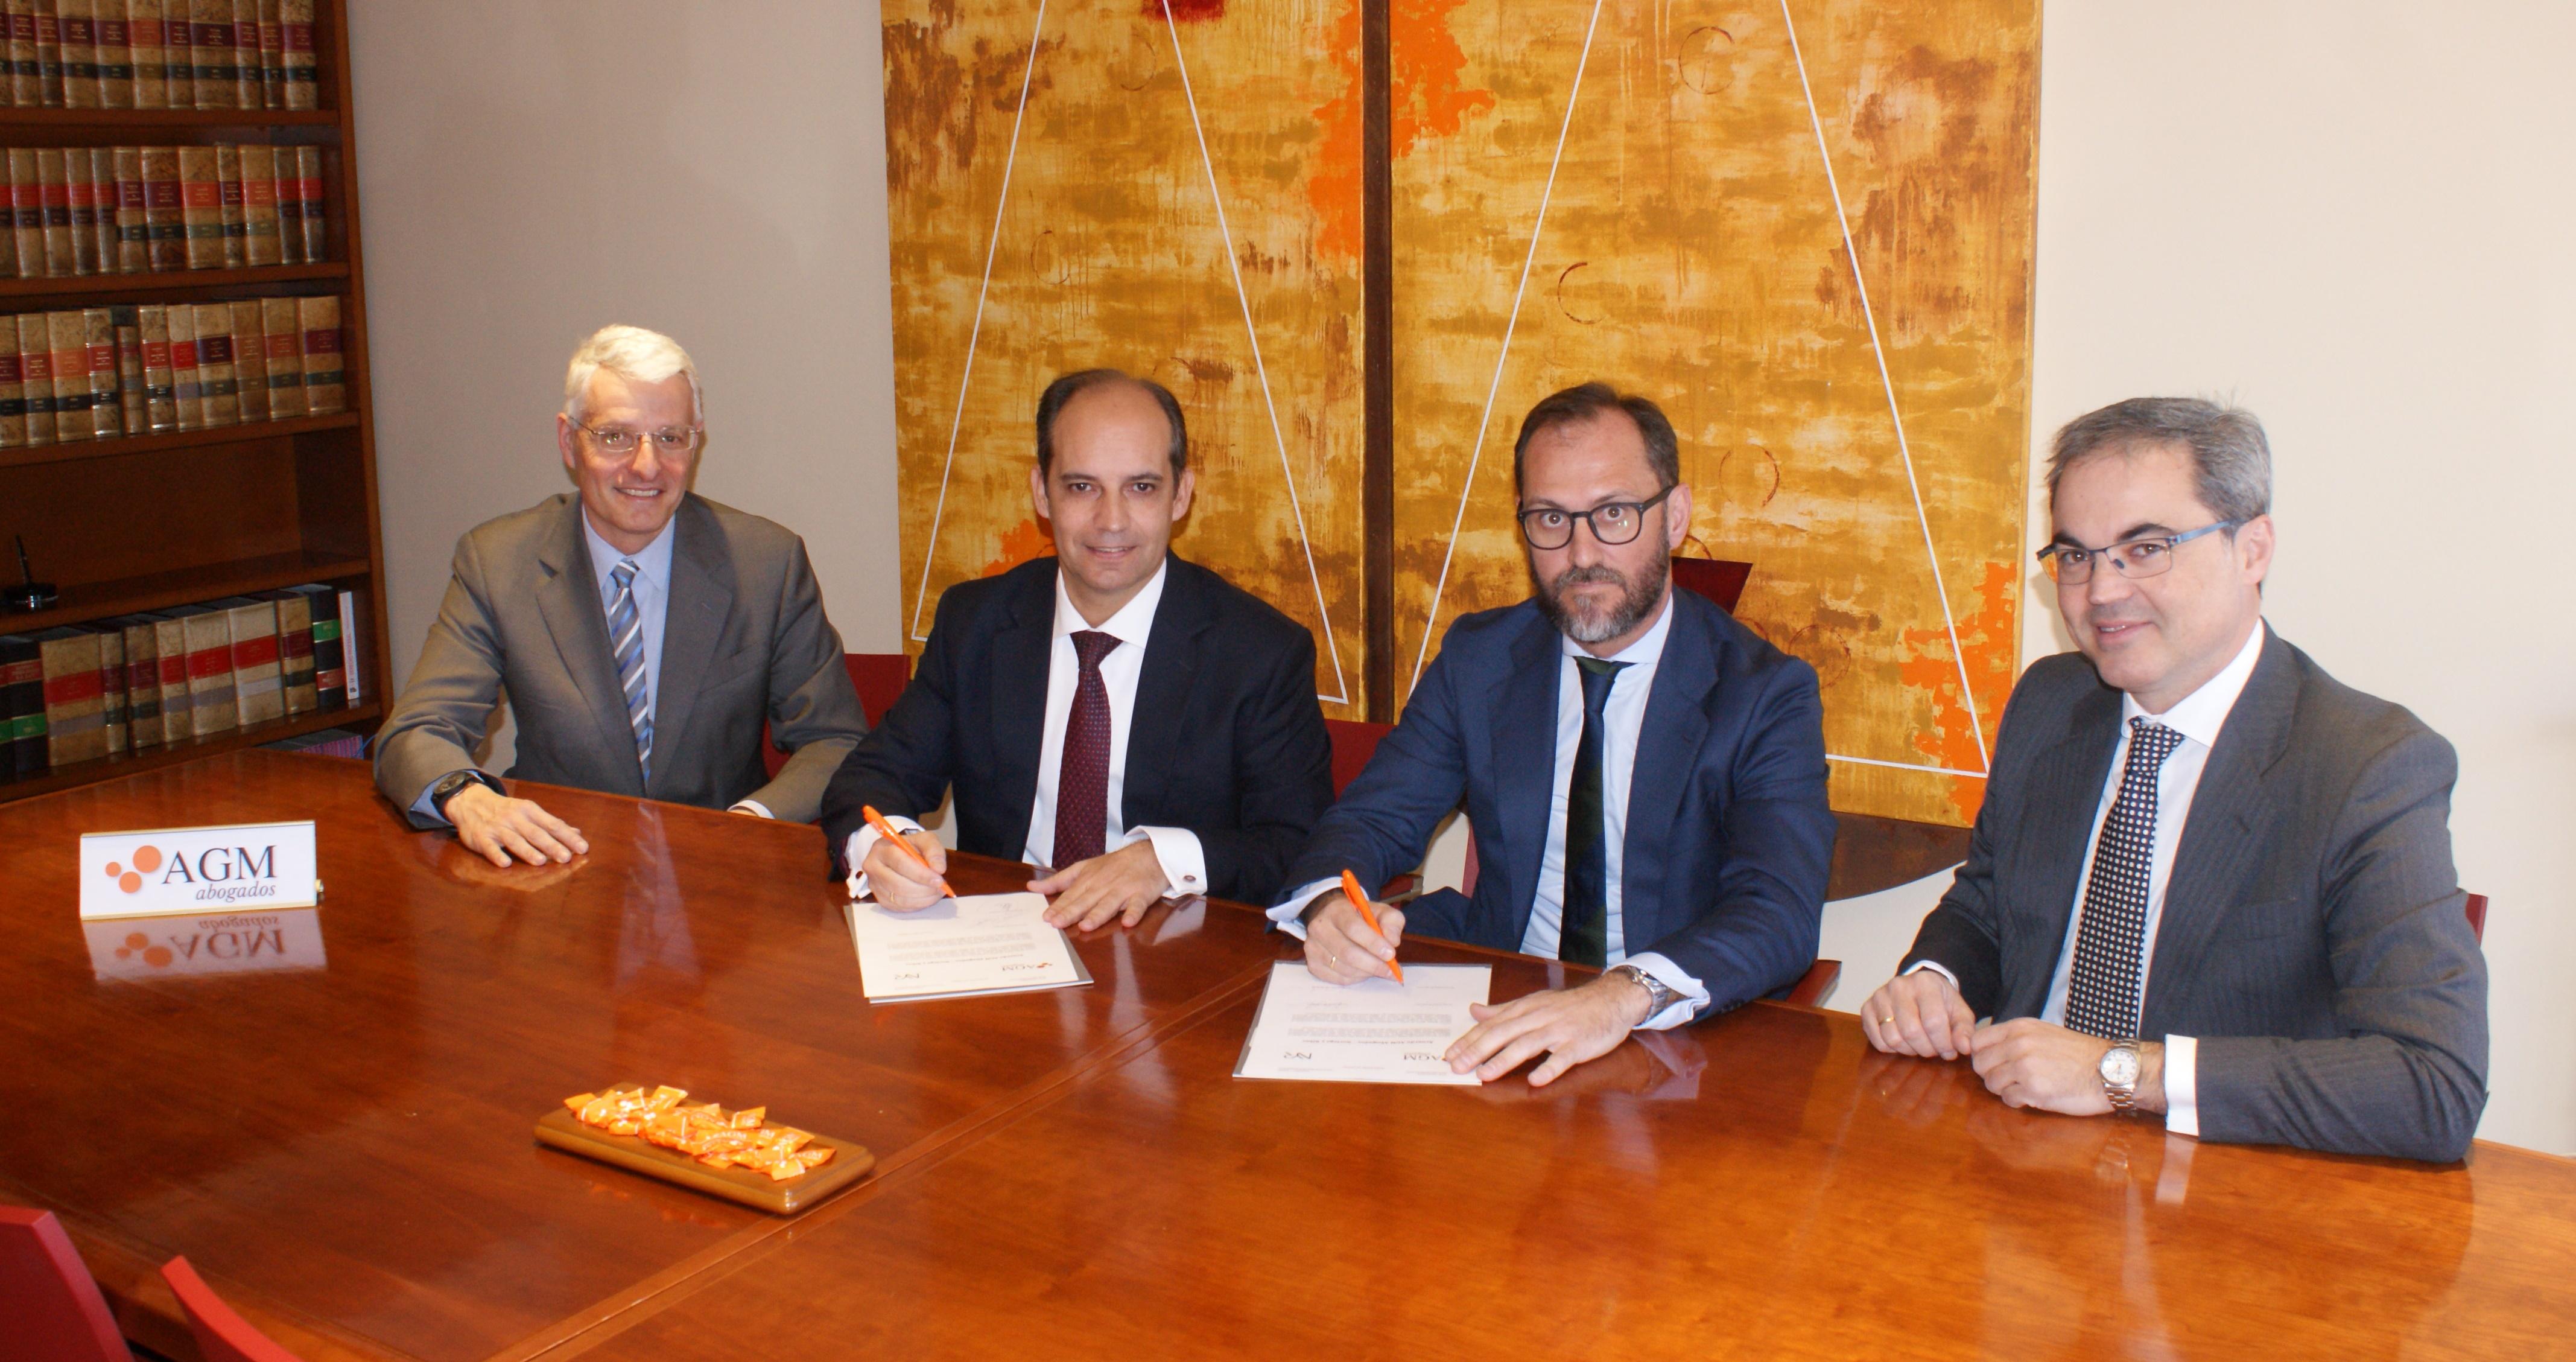 Noriega y Riber joins AGM Abogados